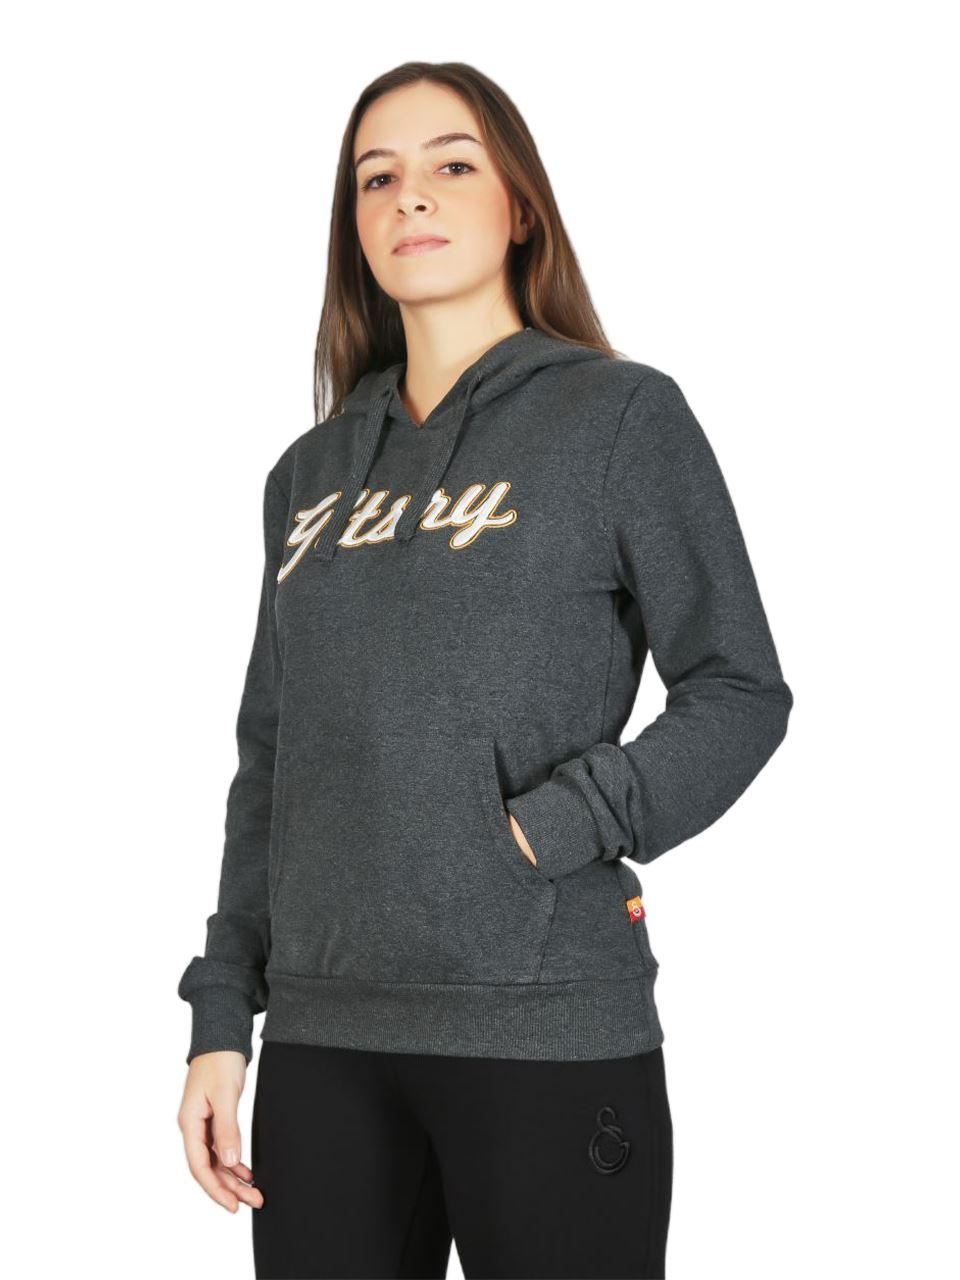 K95168 Sweatshirt